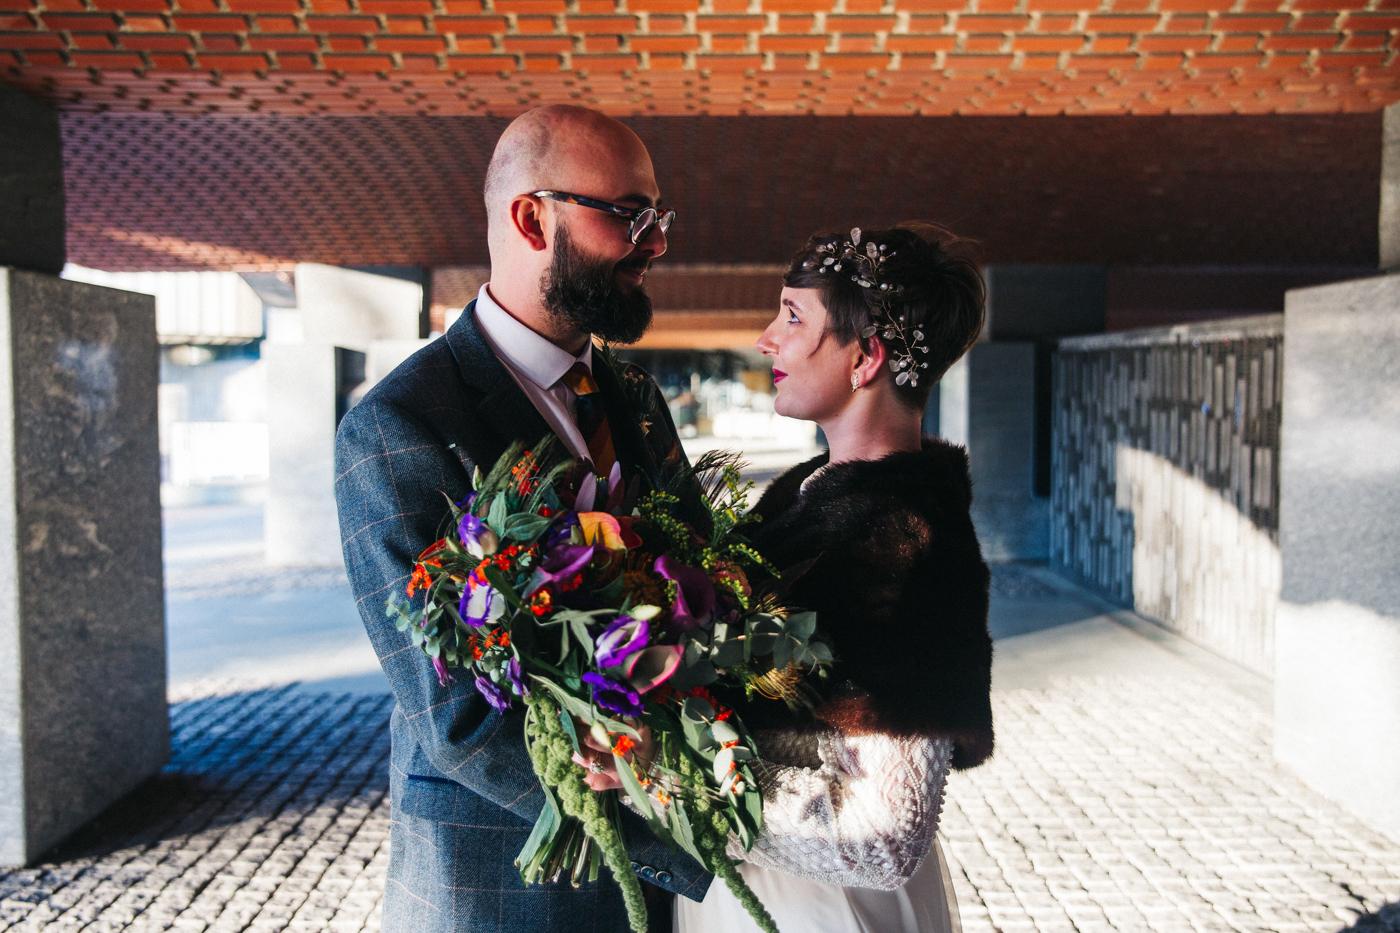 teesside-newcastle-gateshead-wedding-photography-photographer-creative-0047.jpg